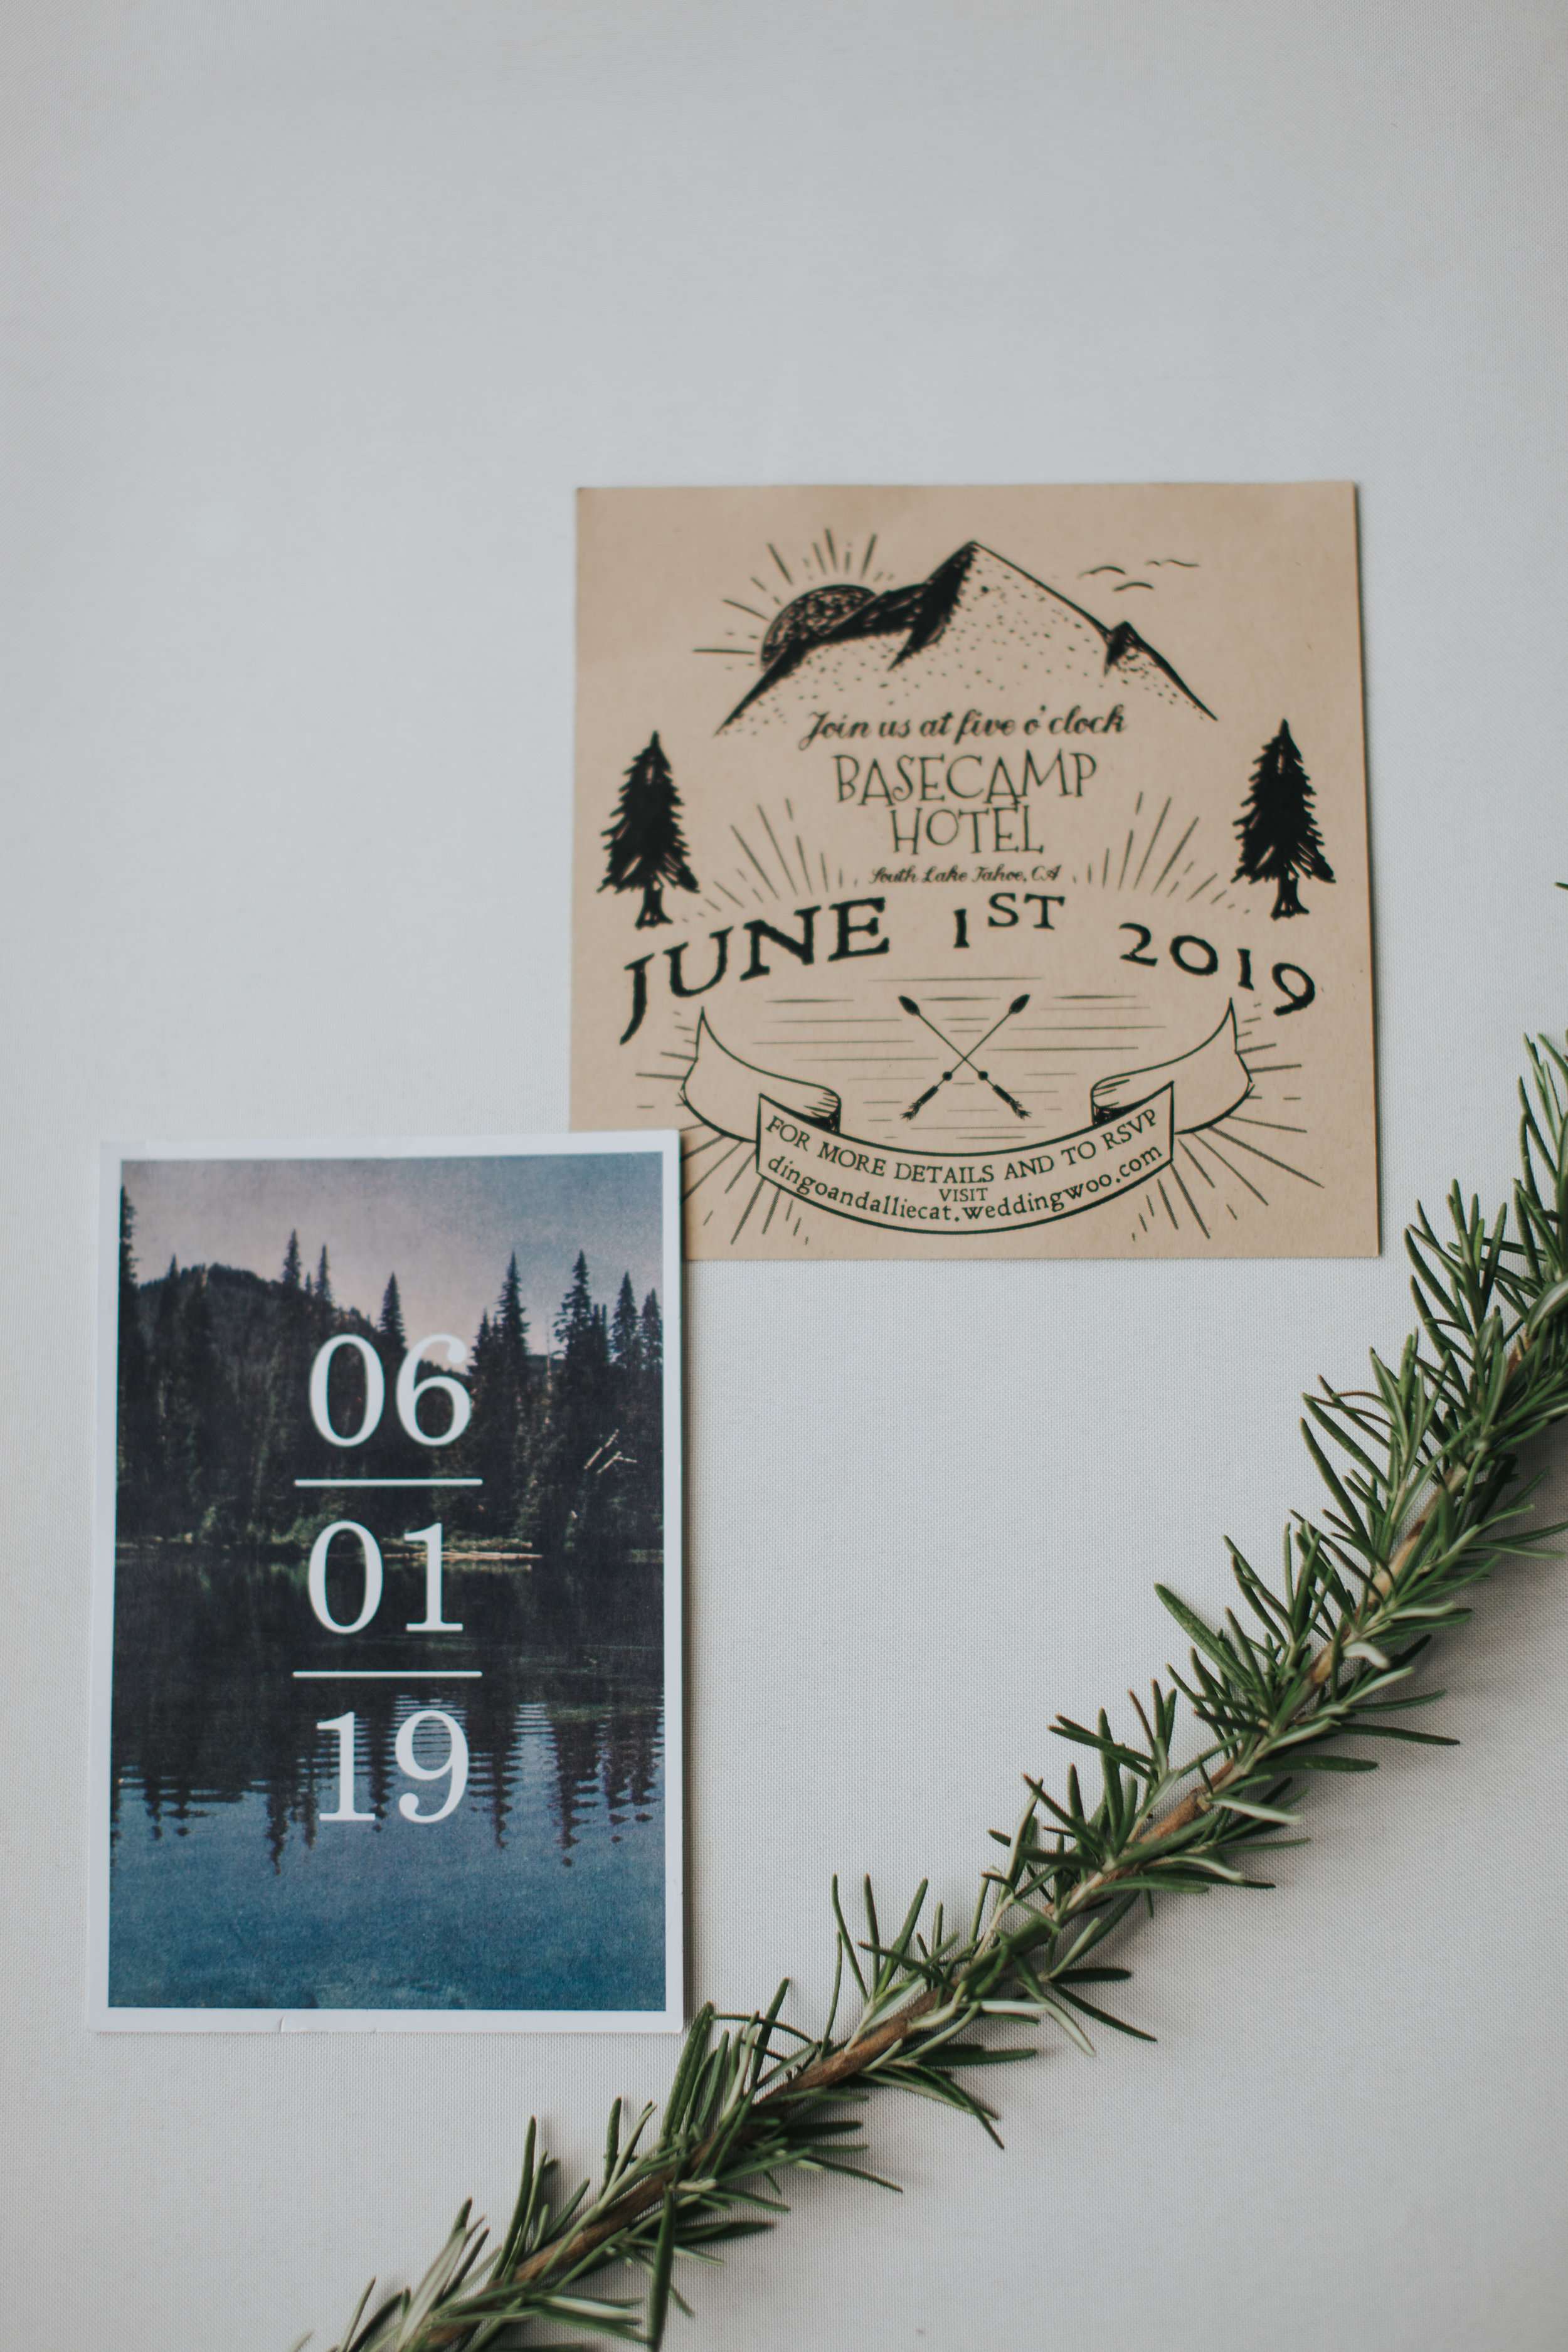 south-lake-tahoe-elopement-valerie-lendvay-photo-045.jpg